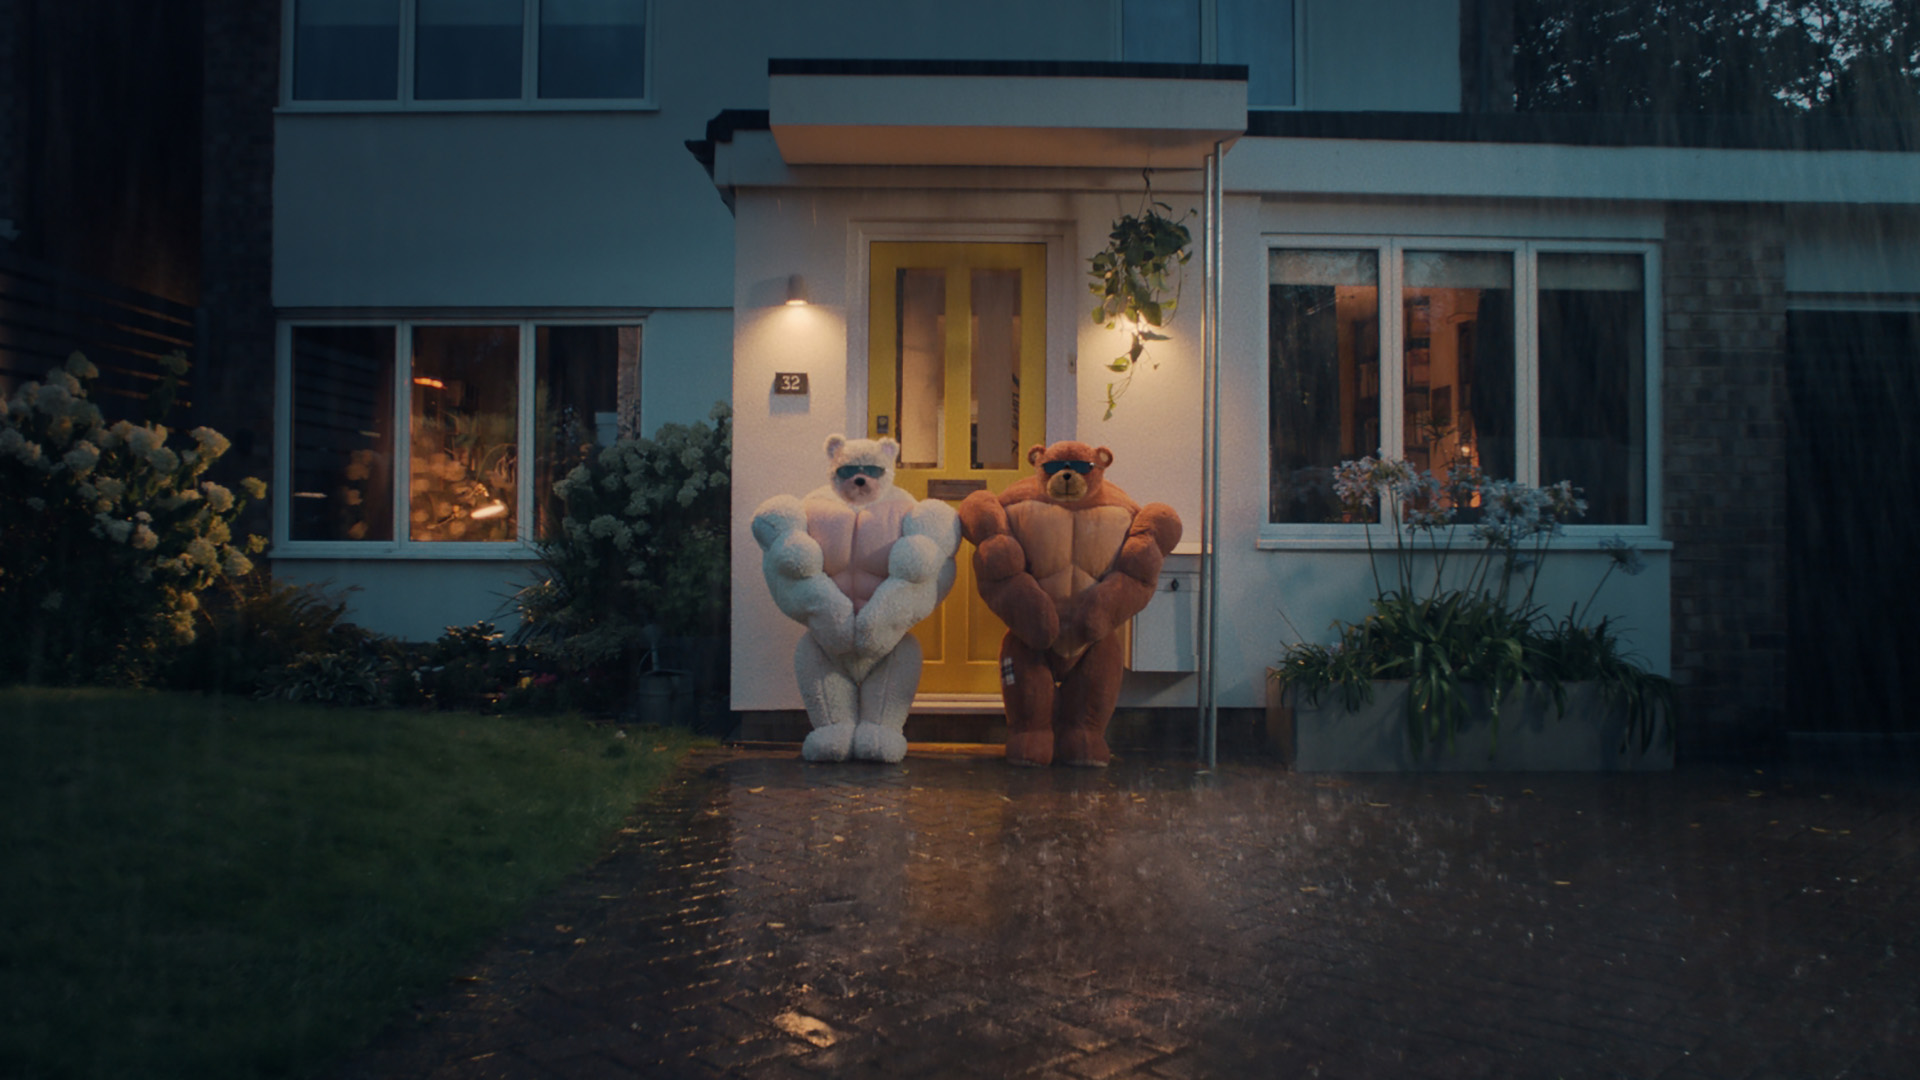 IKEA - Brawn Bears